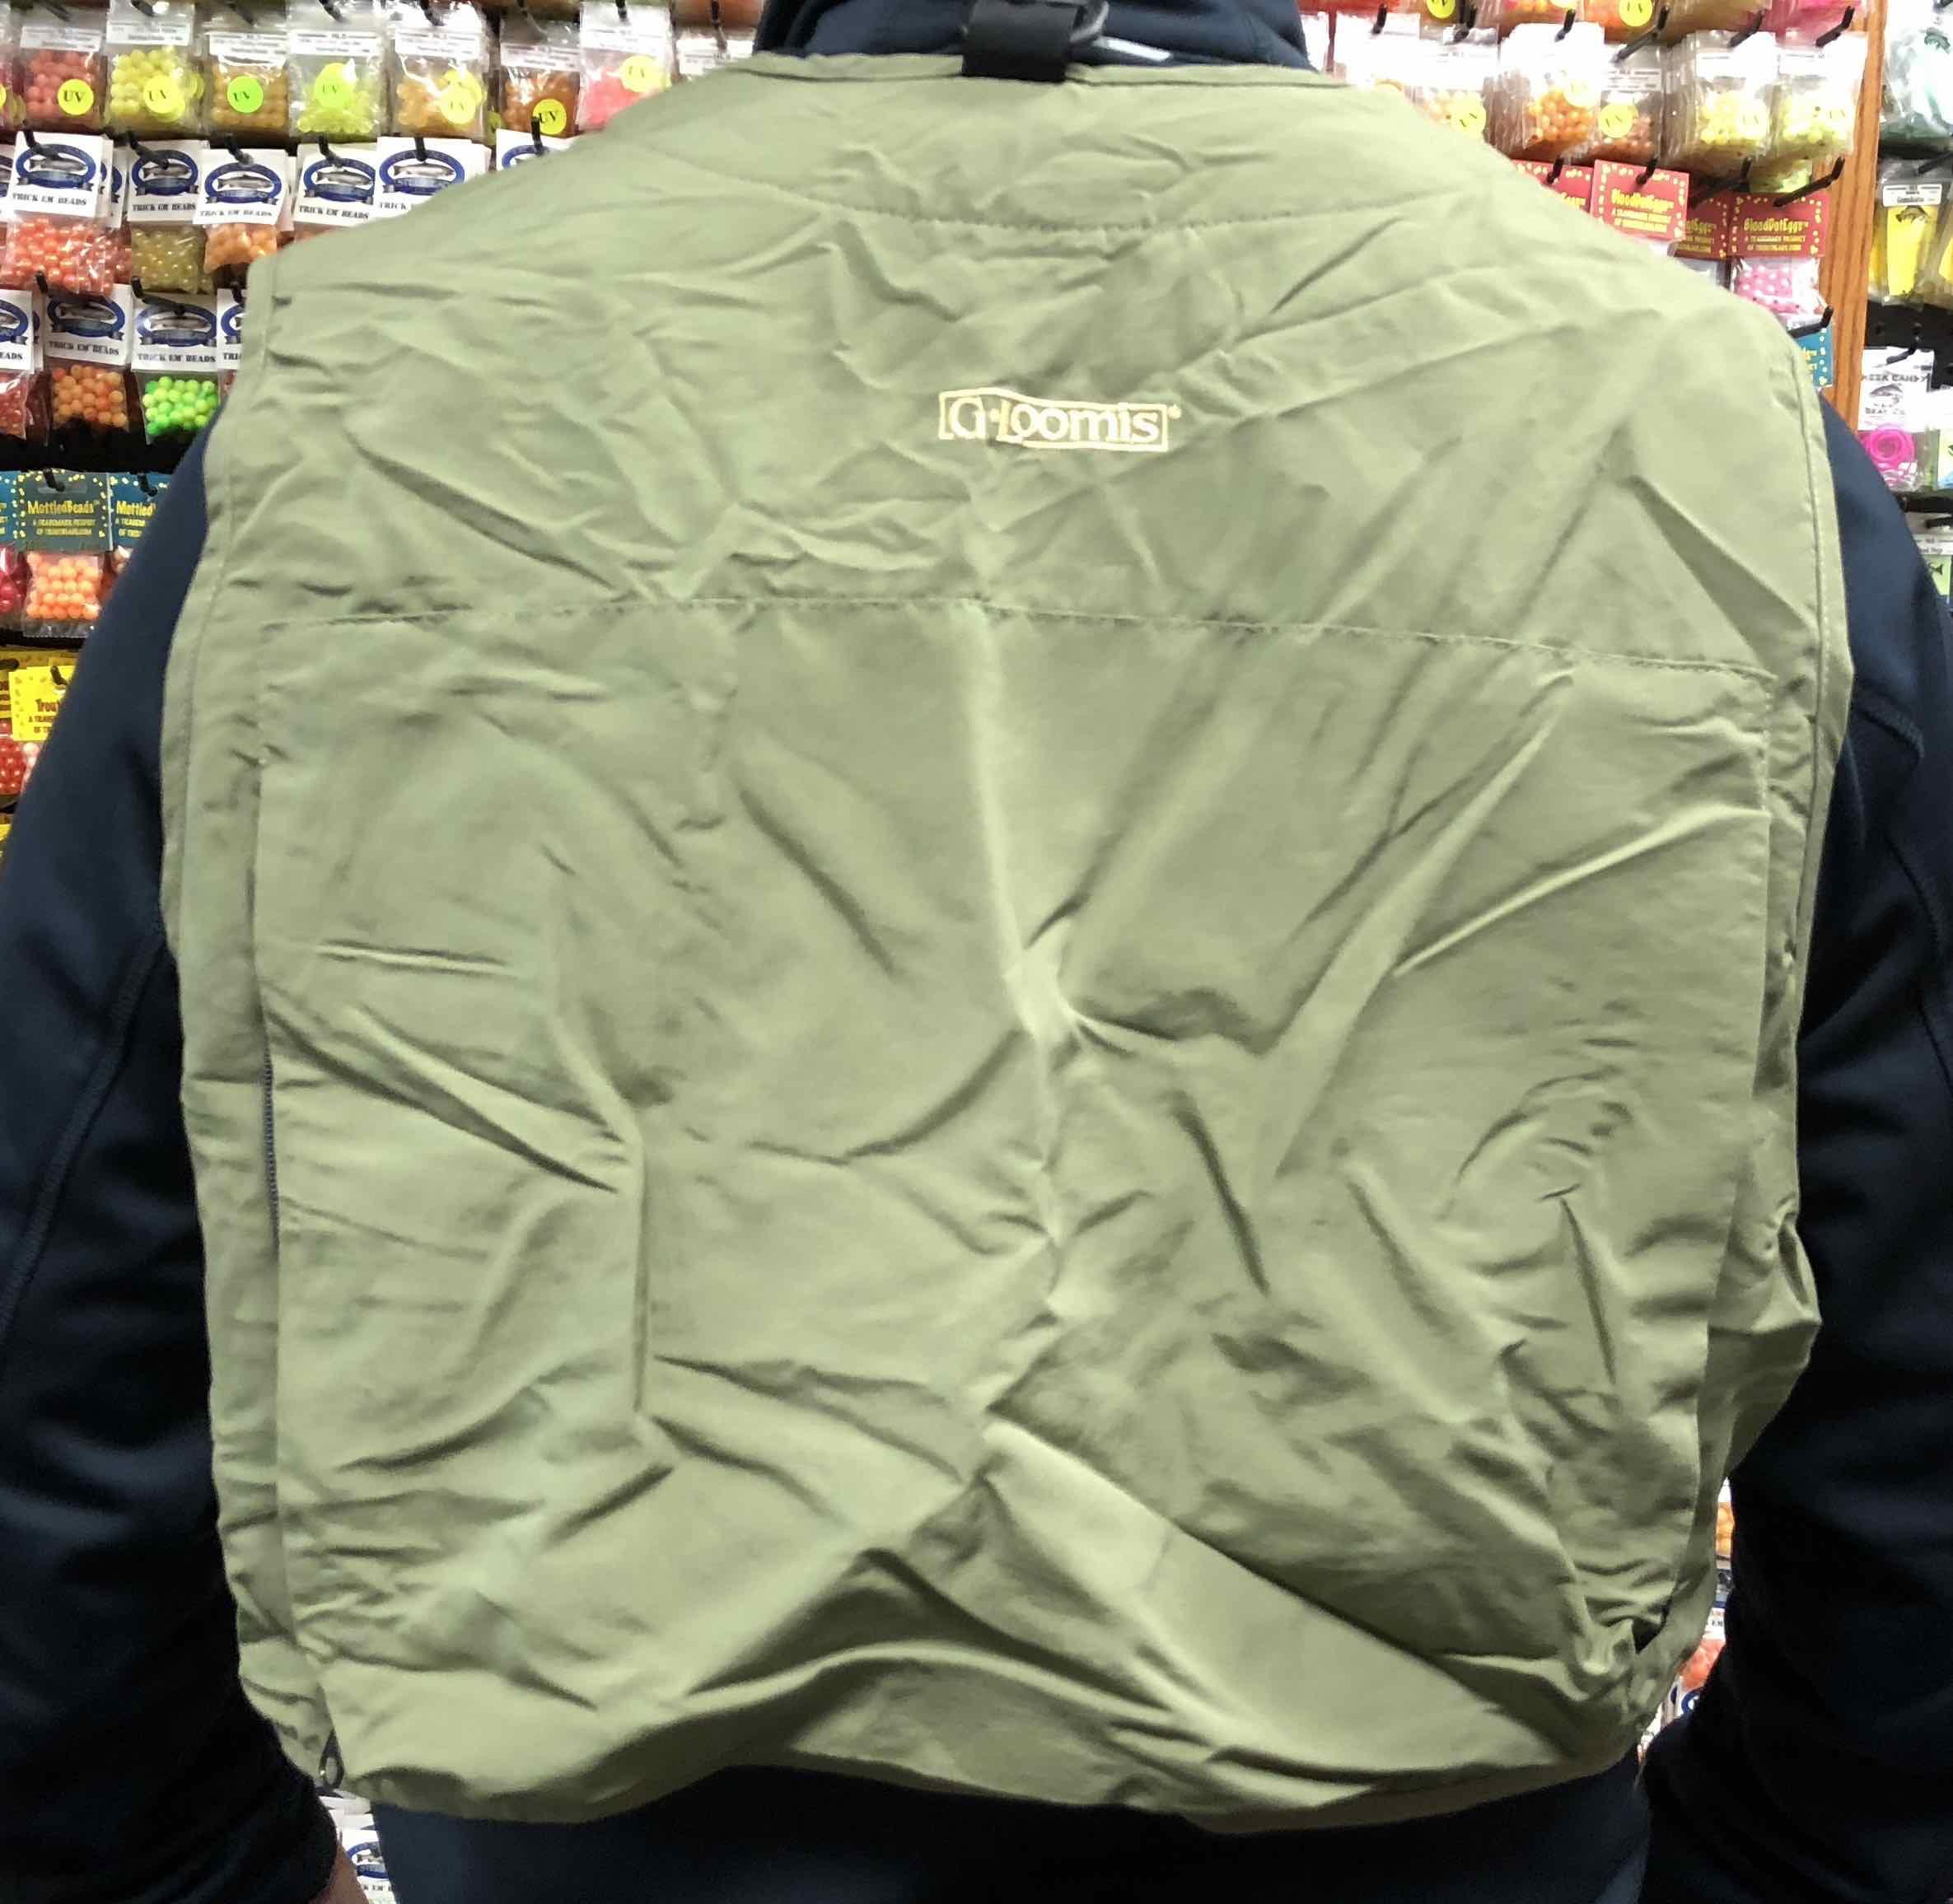 G. Loomis Fishing Vest - Size XL - LIKE NEW! - $50